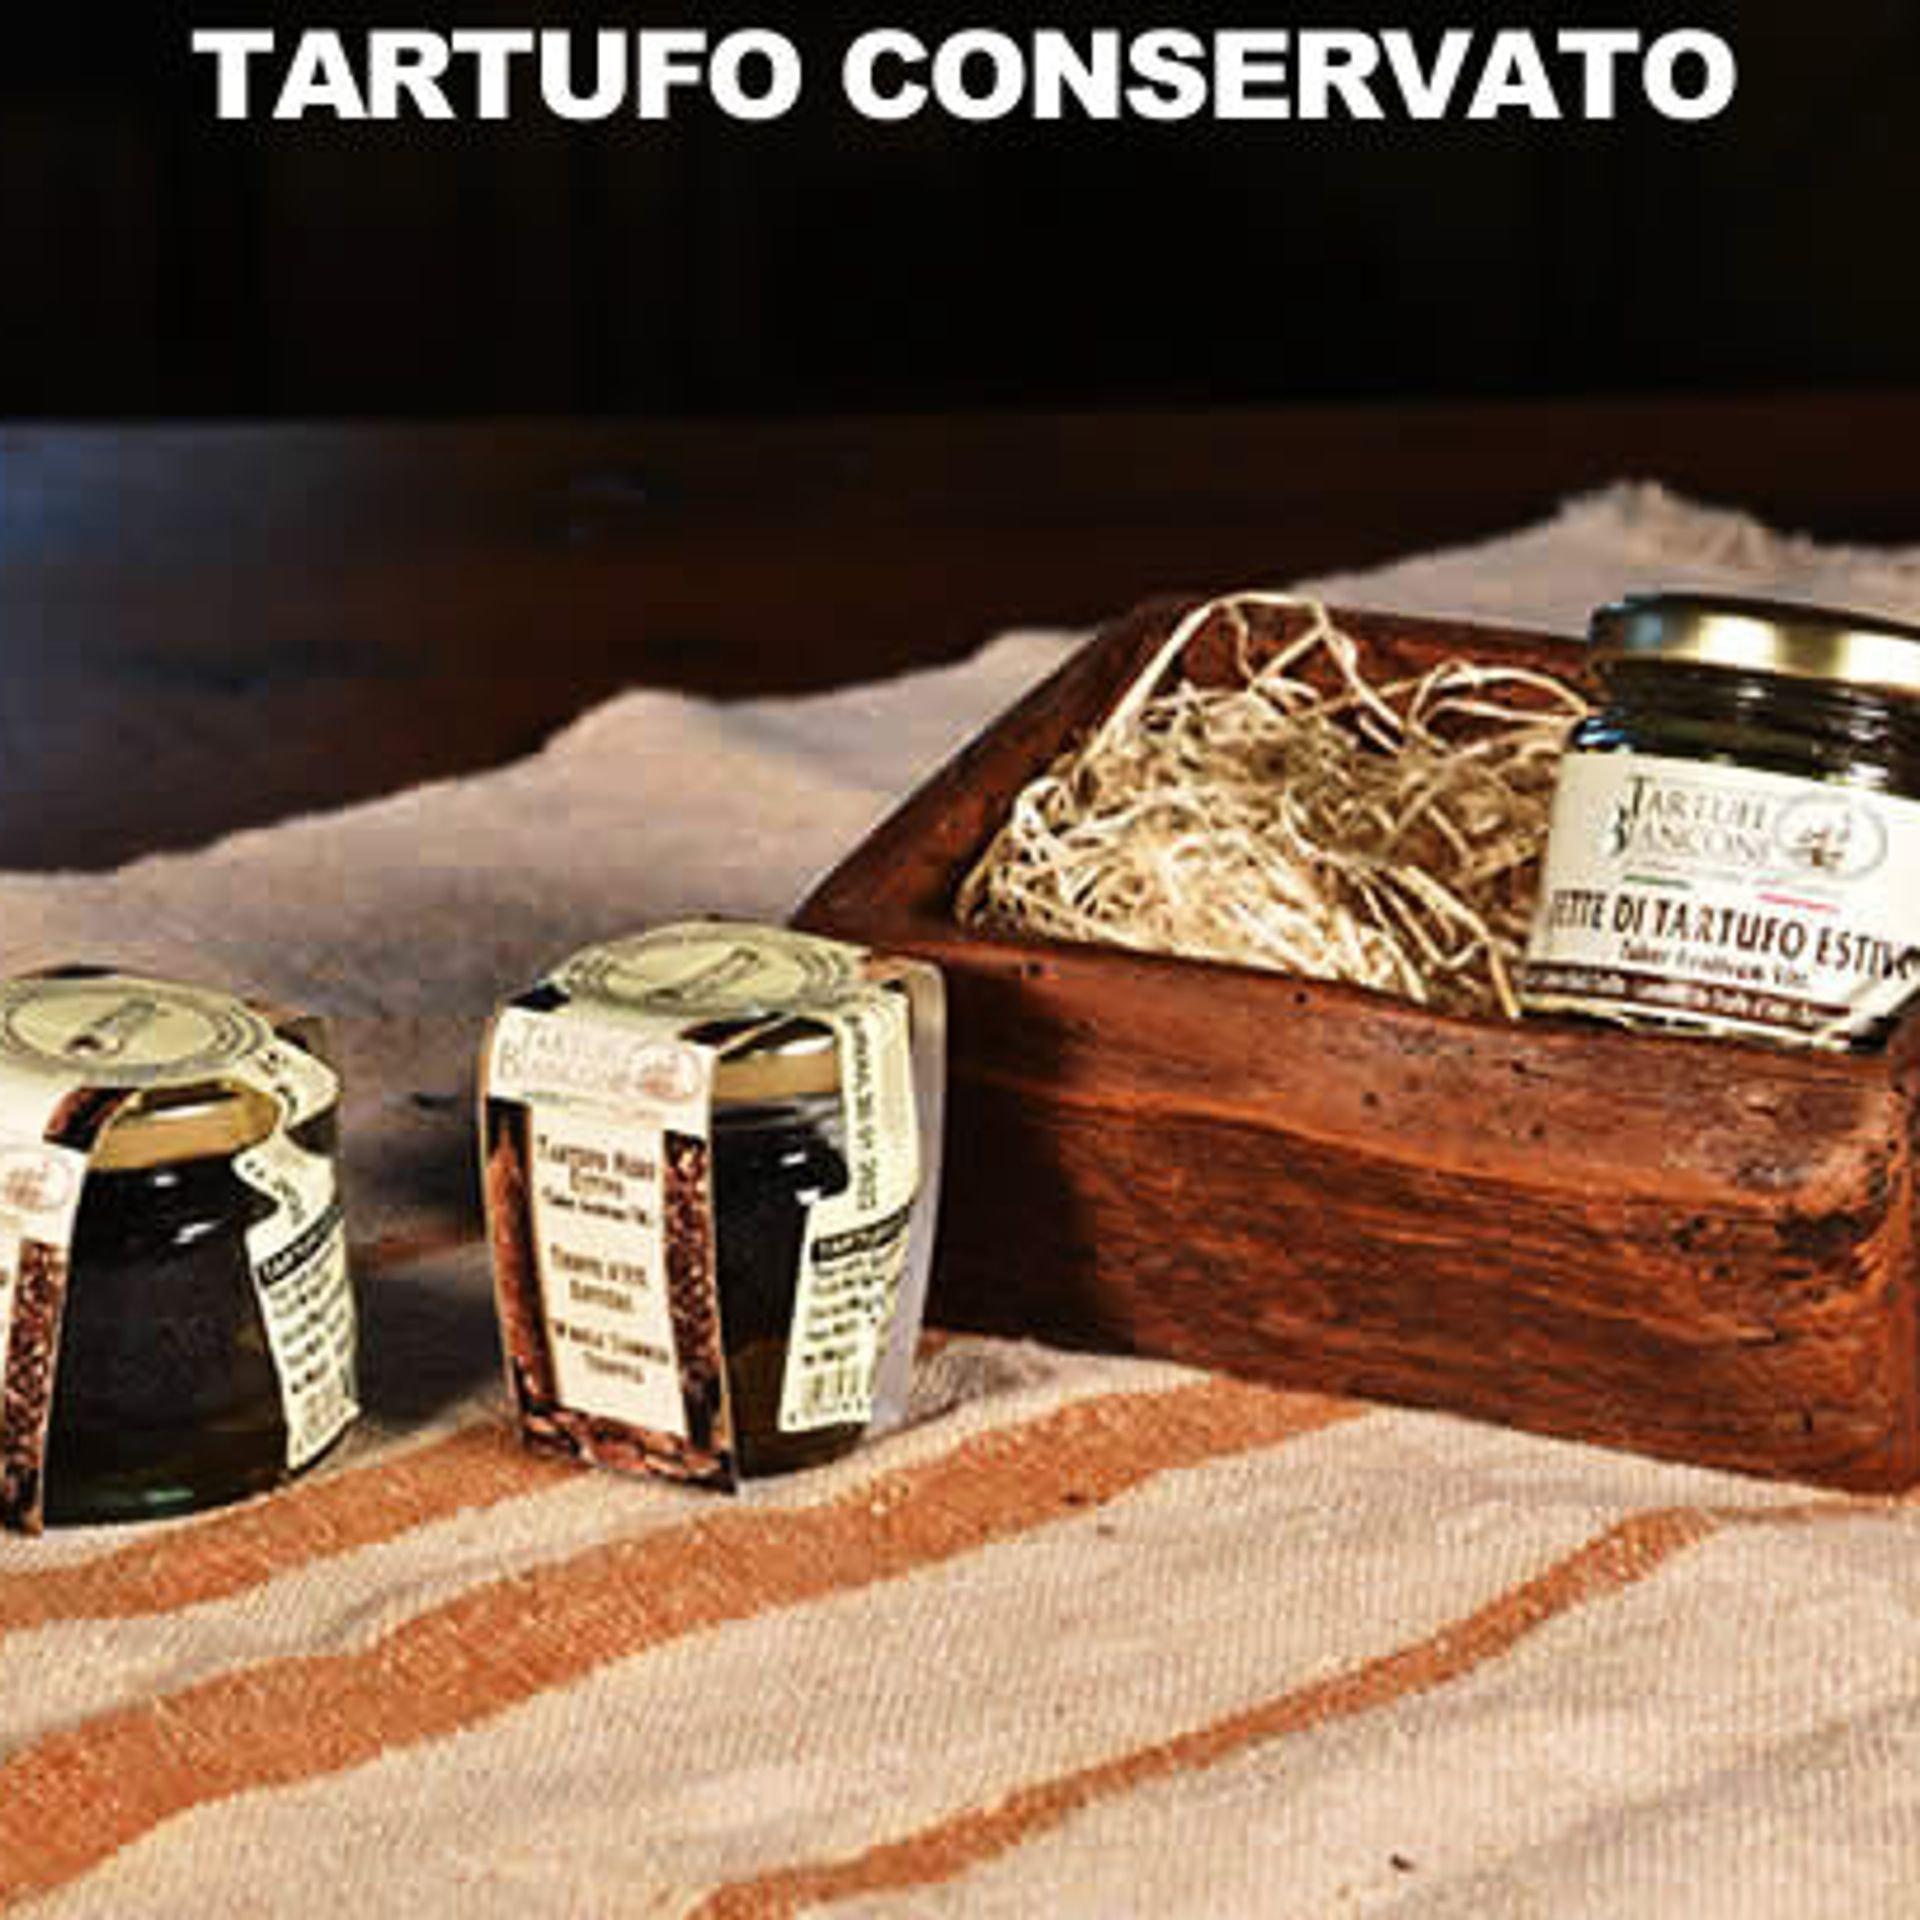 tartufo conservato, tartufi, tartufi bianconi